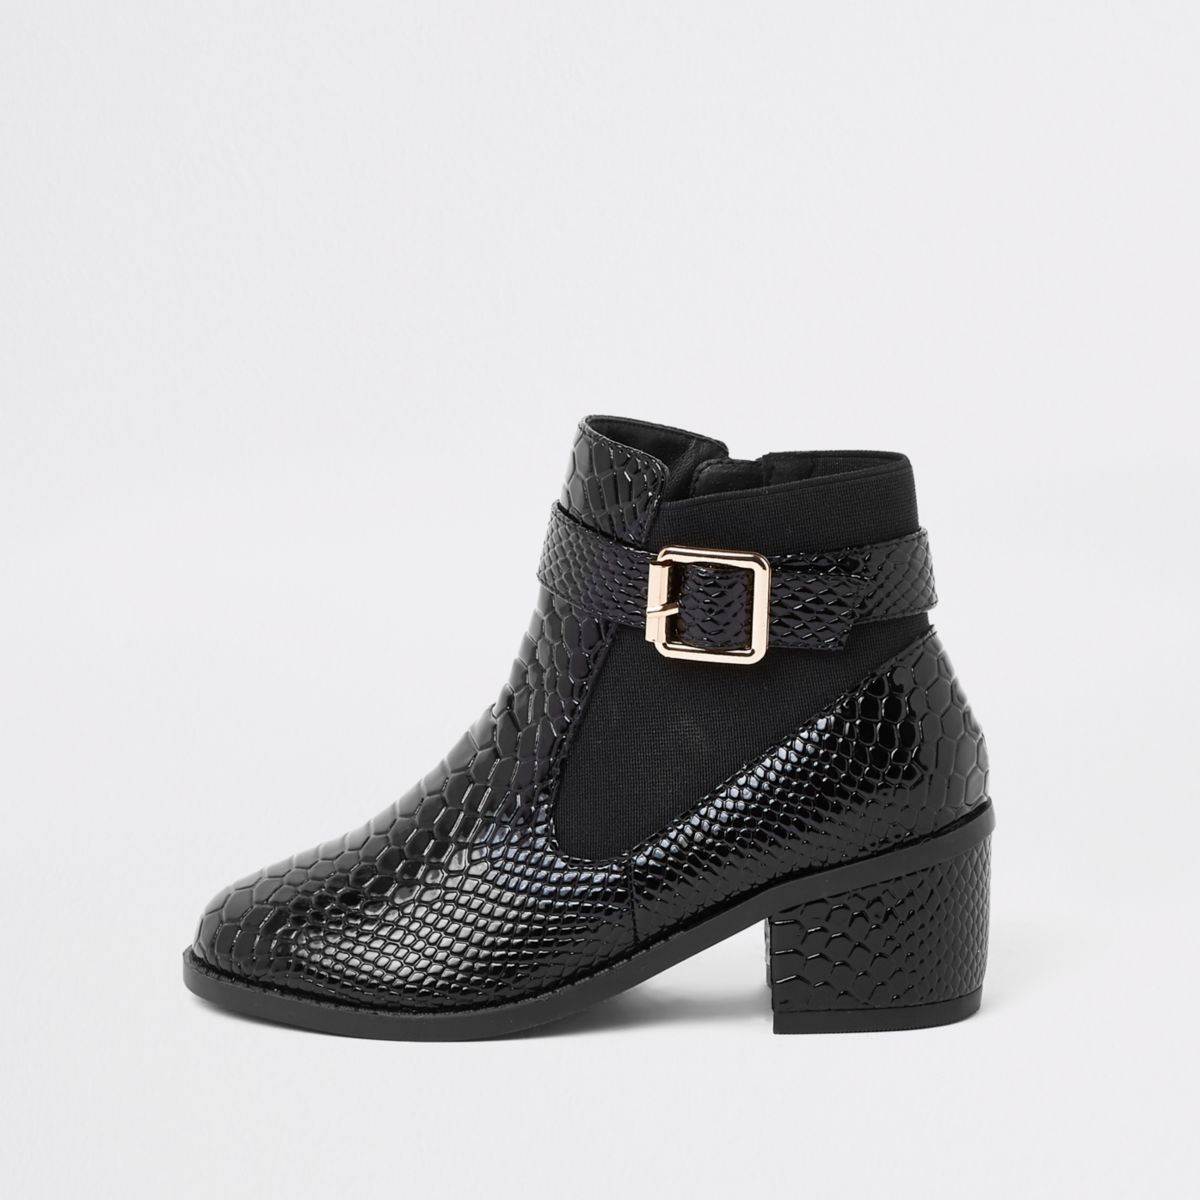 Girls black patent croc side buckle boots